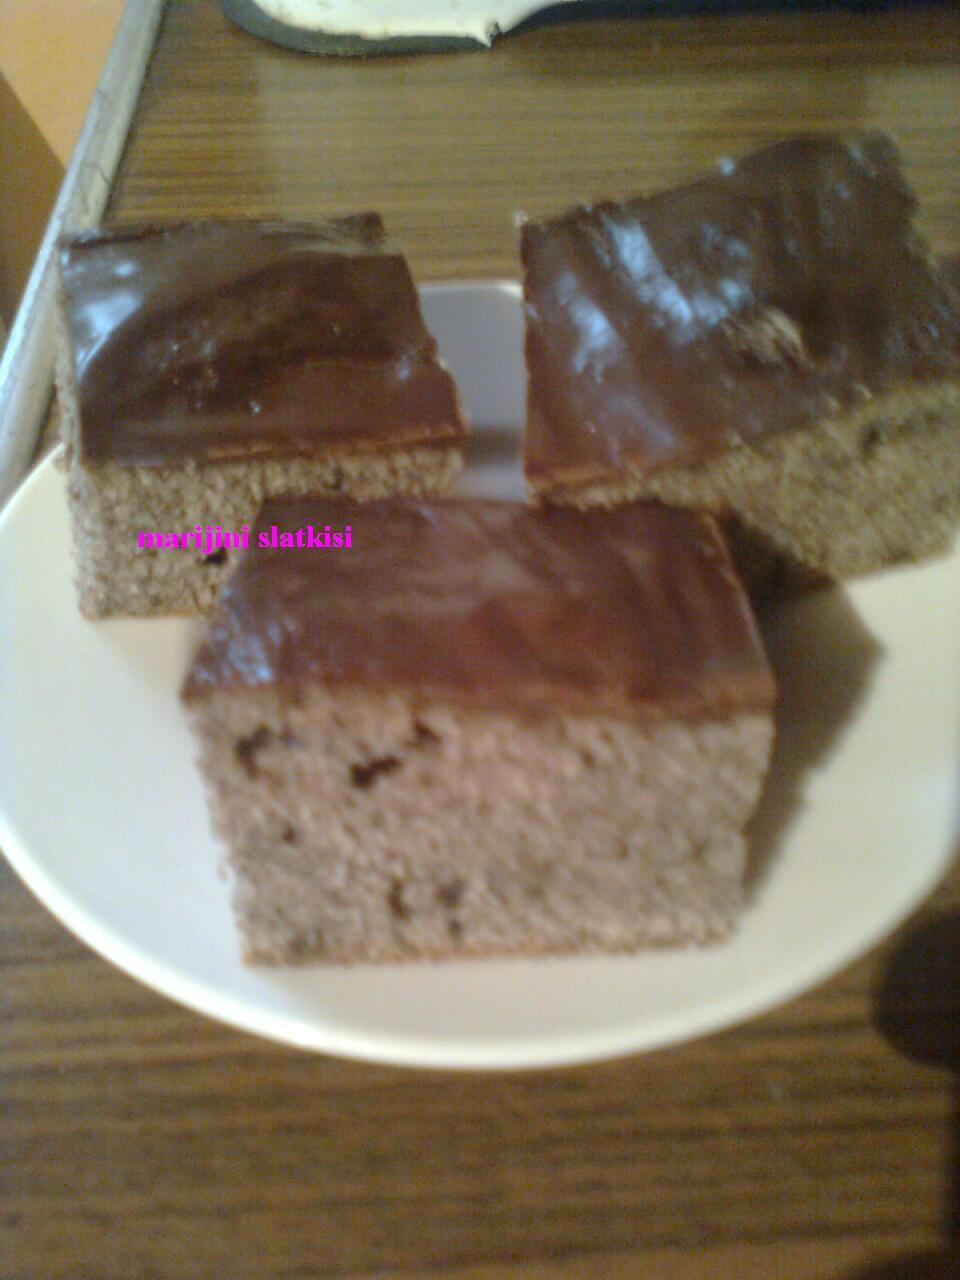 Kolaci Banini http://marijinislatkisi.blogspot.com/2011/03/mak-kocke